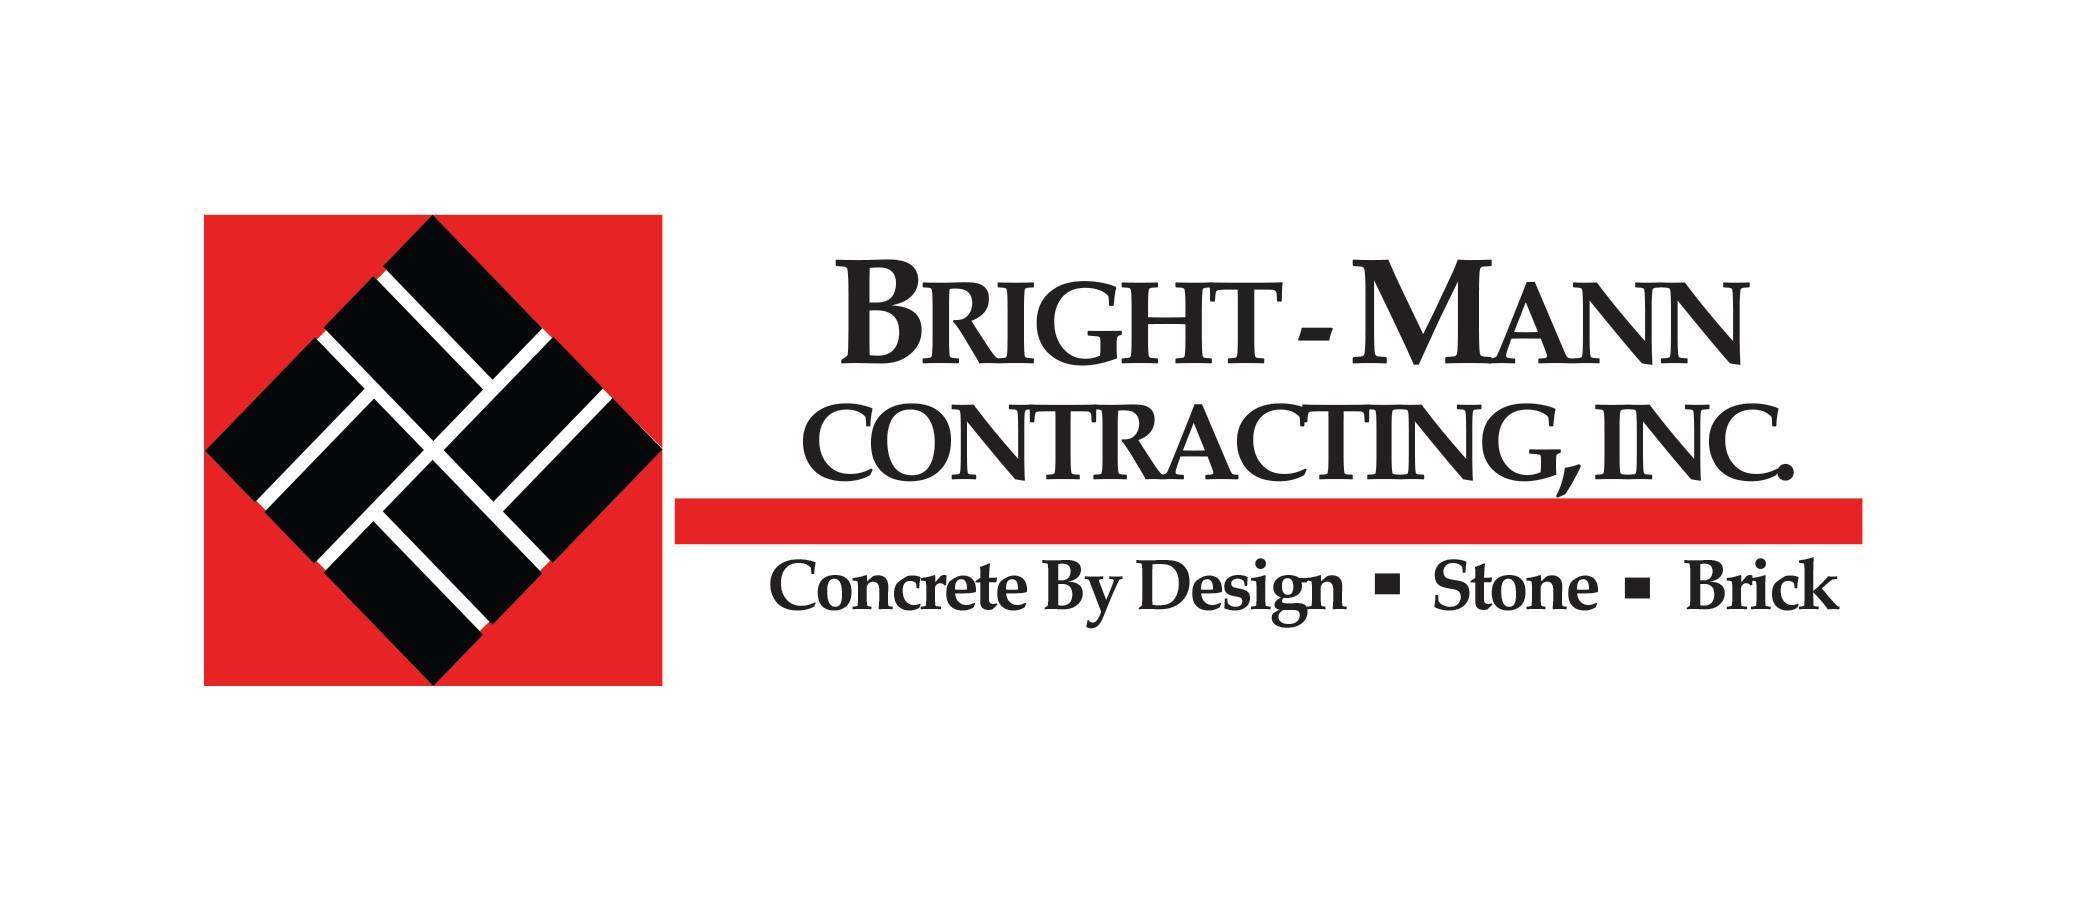 Bright-Mann Contracting Inc. Logo